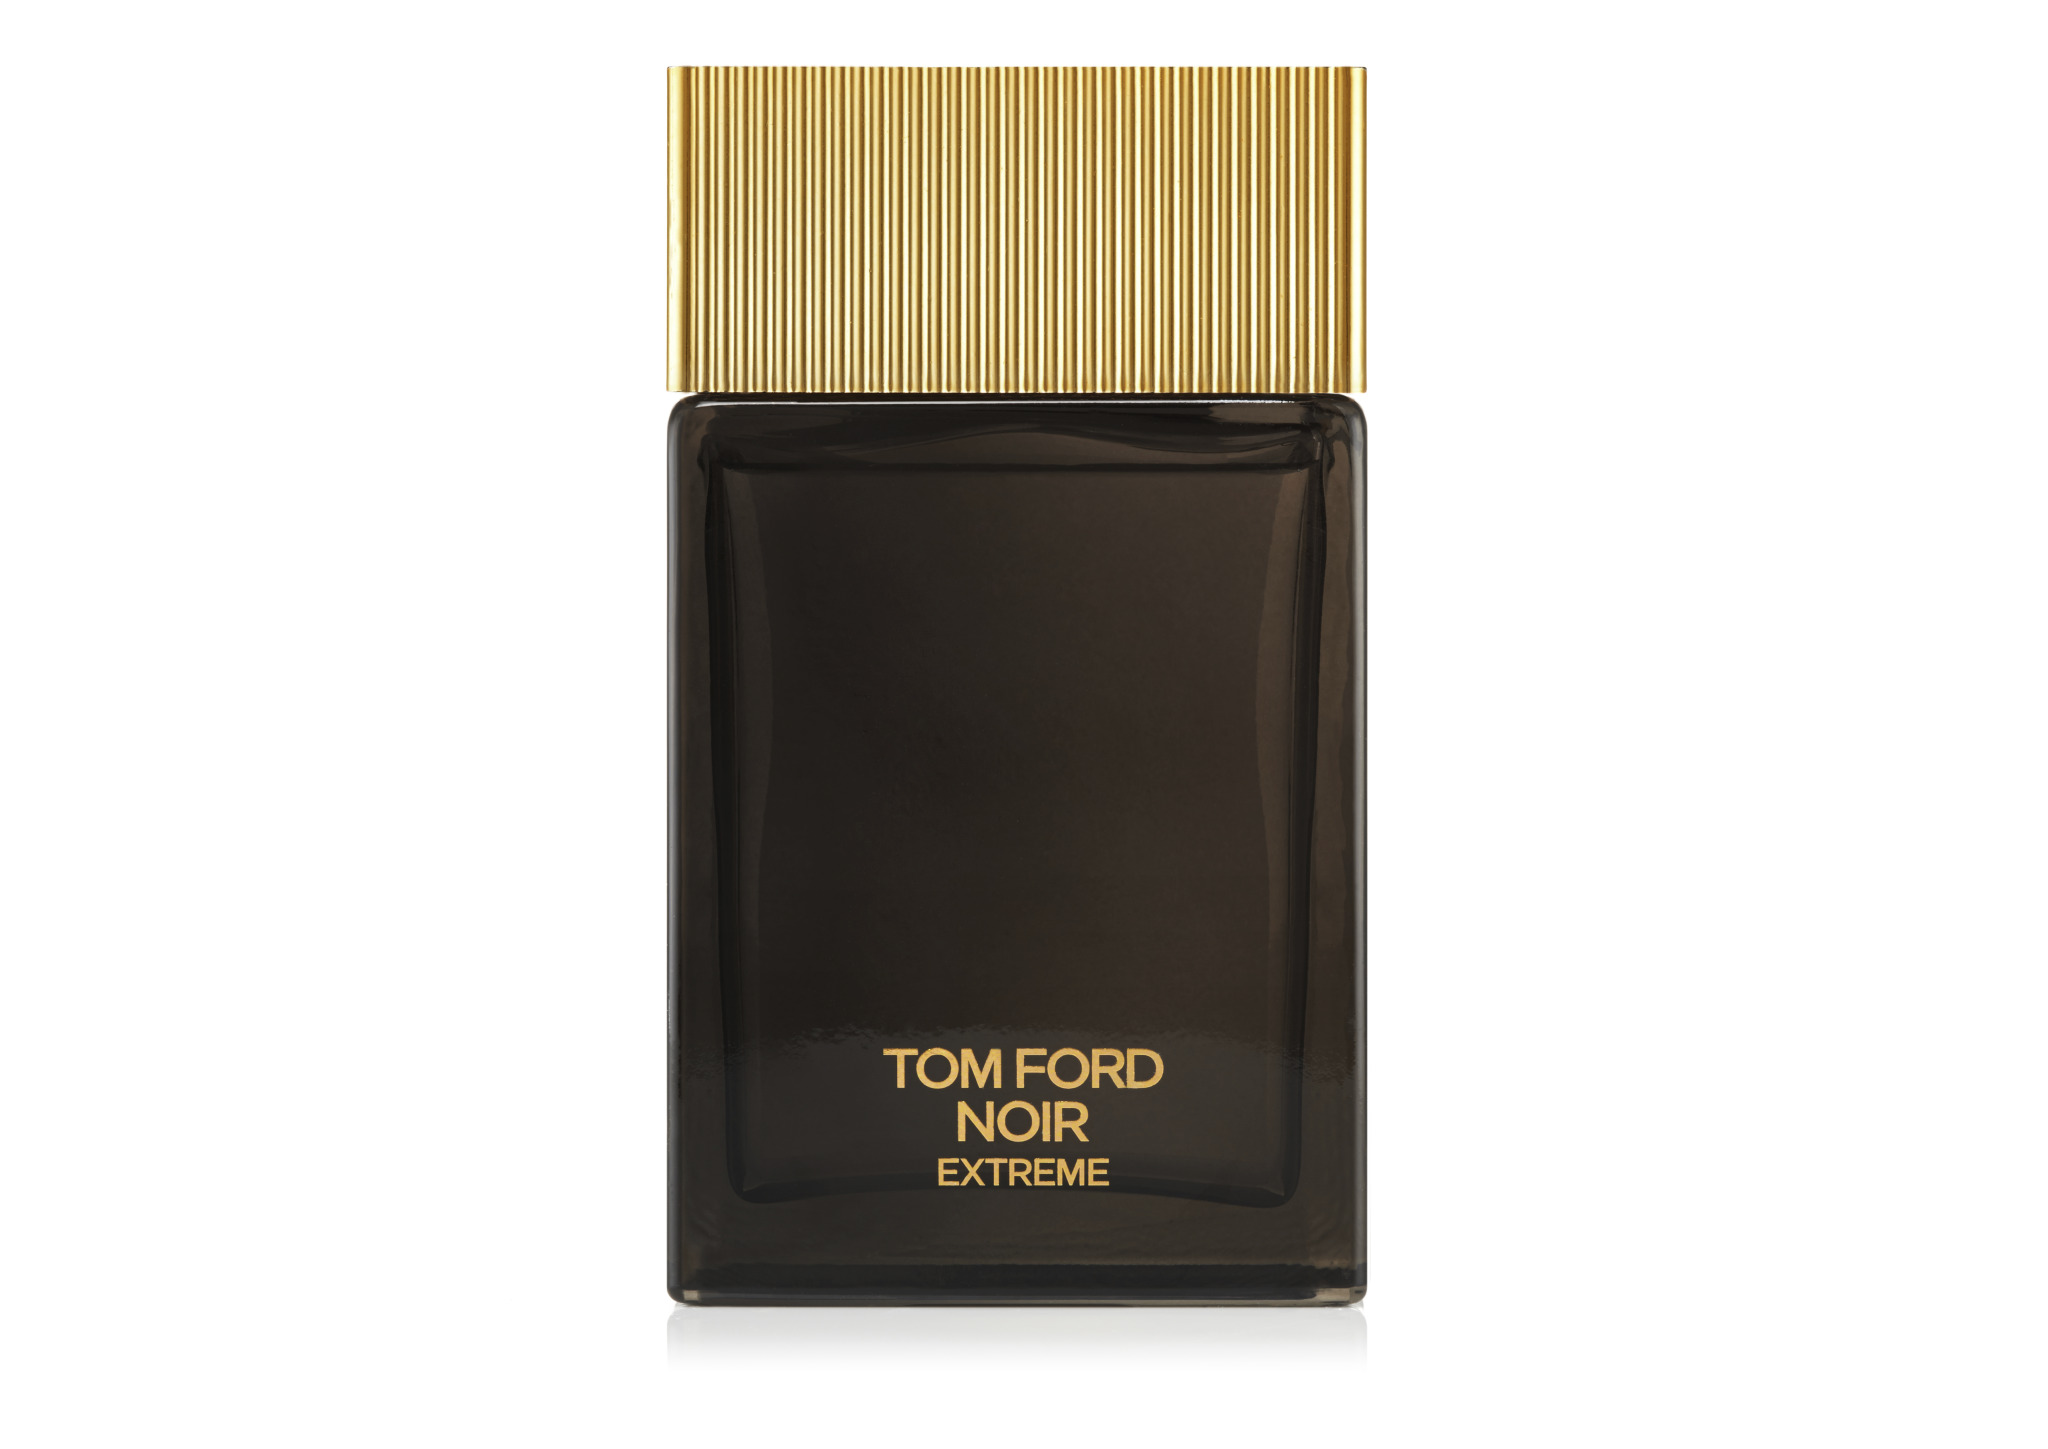 Tom Ford Noir Extreme EDP, 100 ml